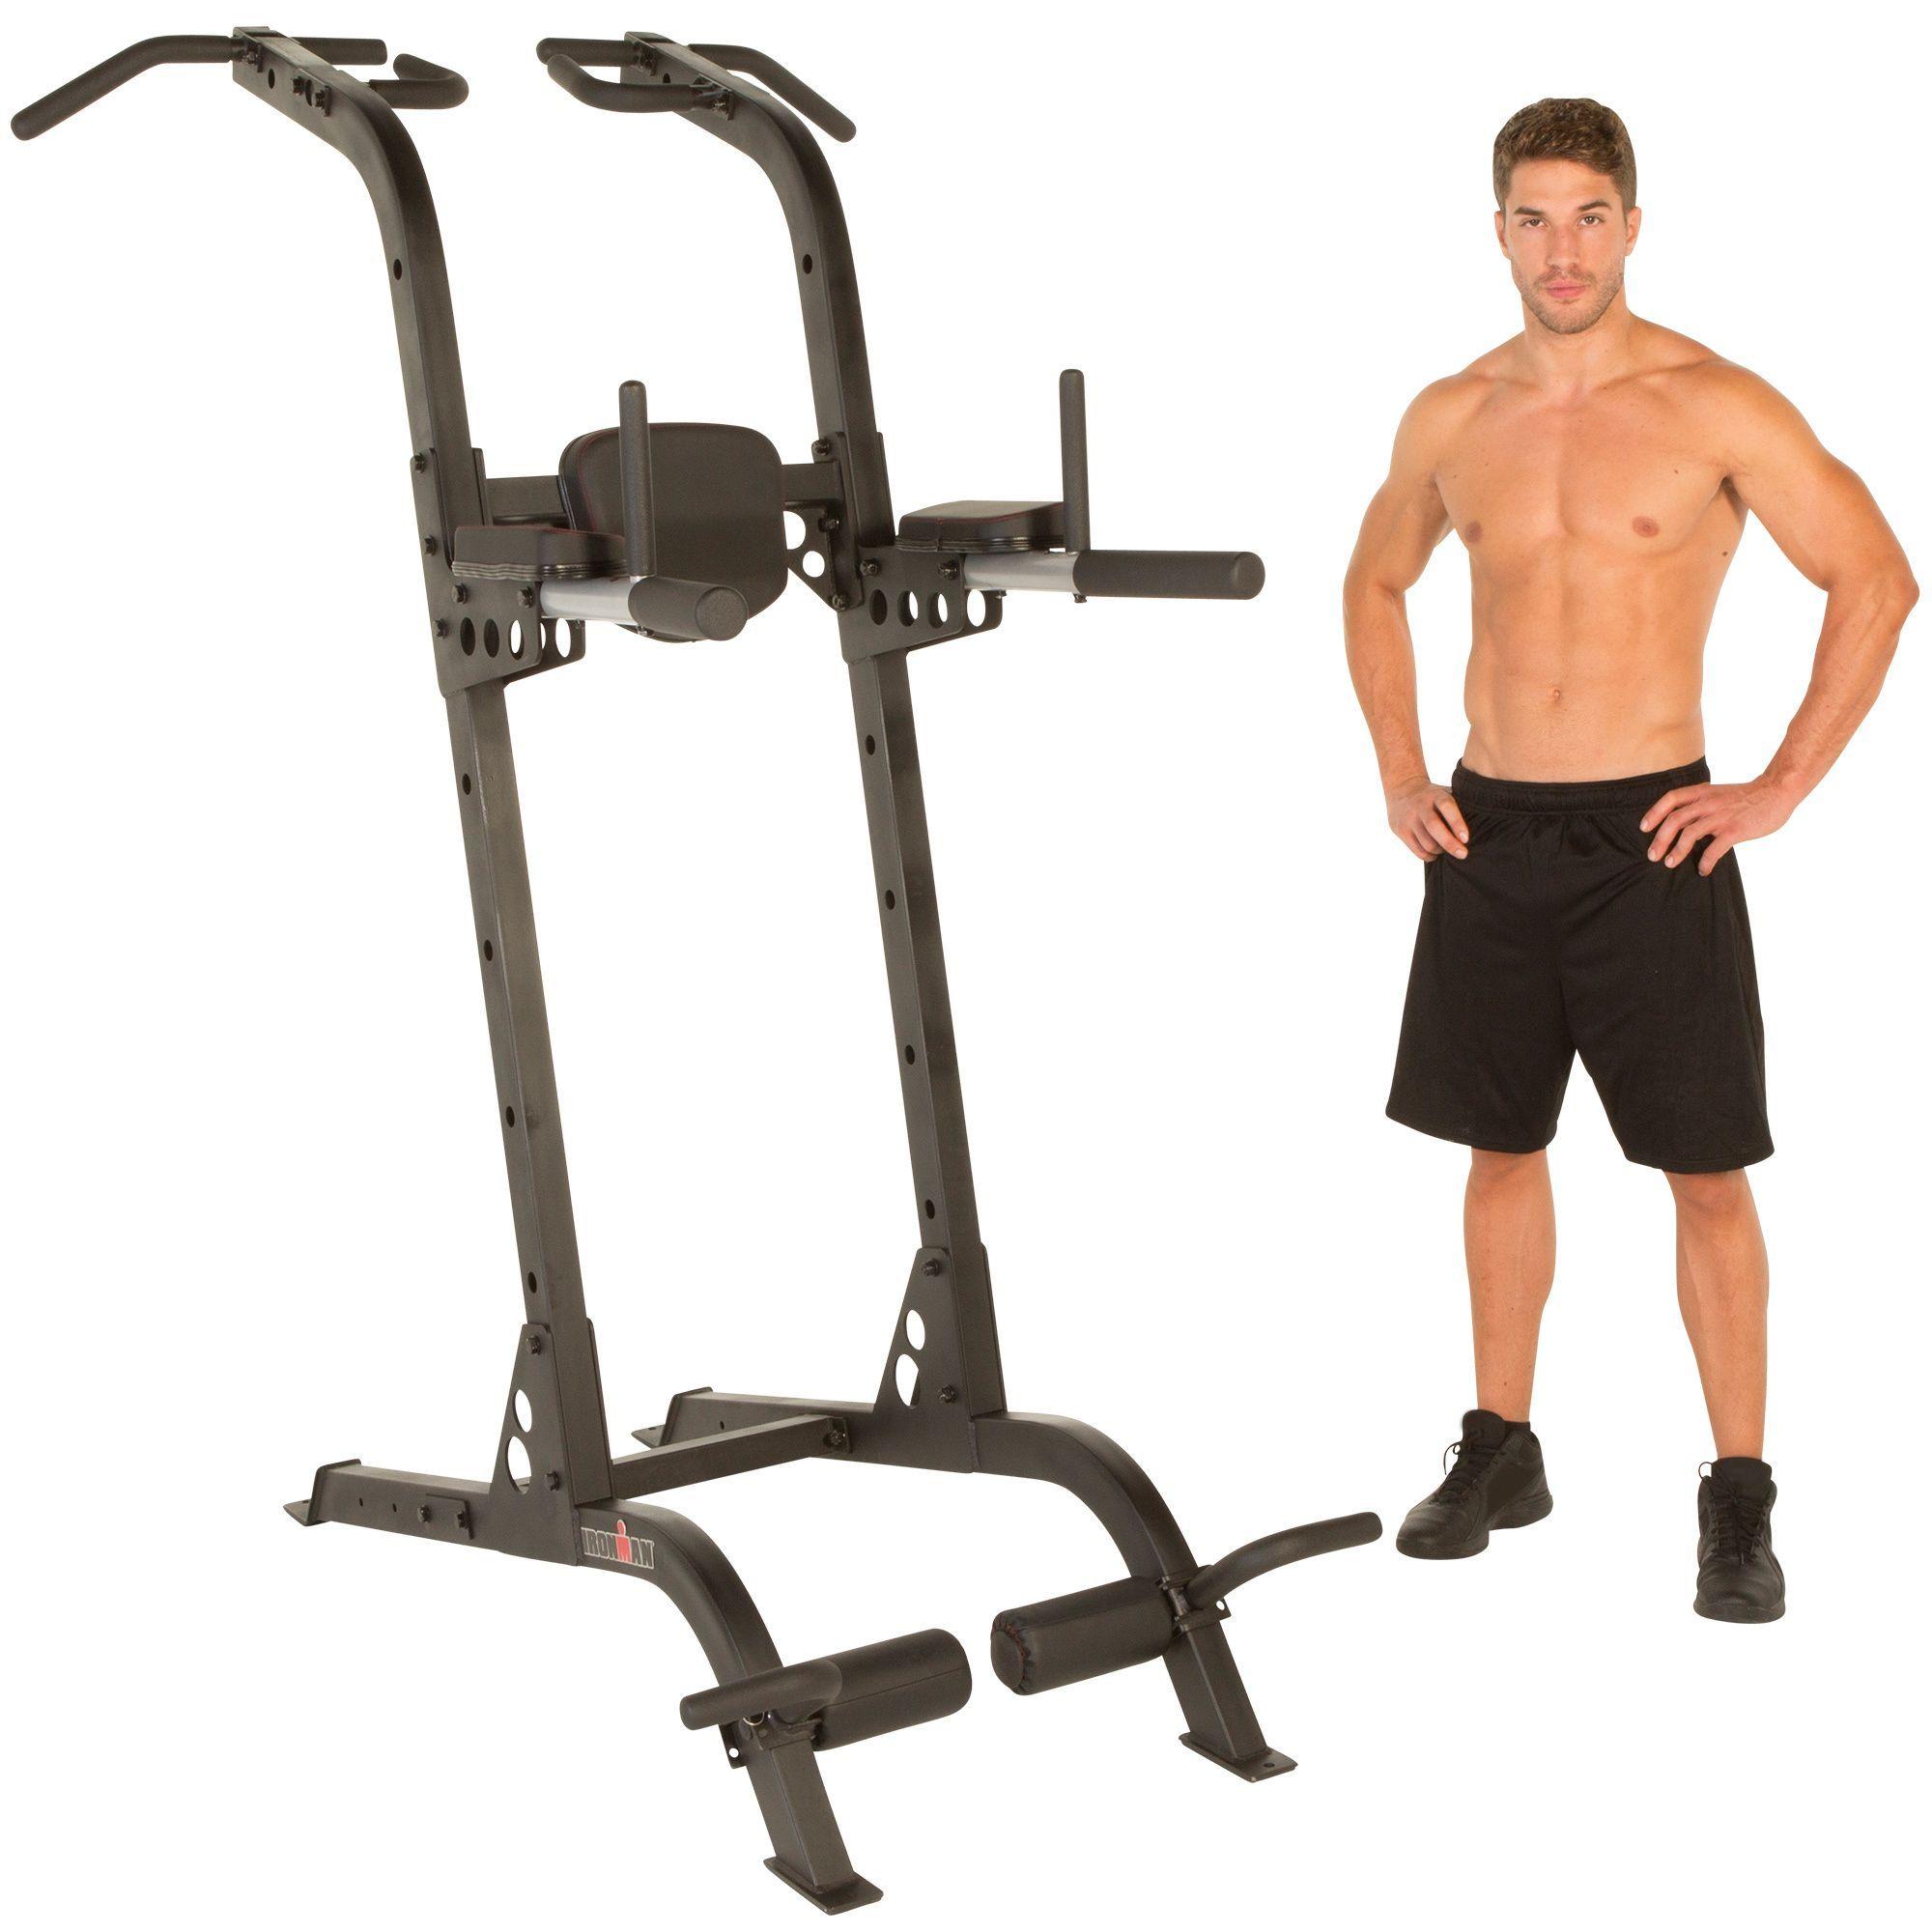 Our Best Fitness Exercise Equipment Deals Equipamentos De Fitness Fitness Esporte